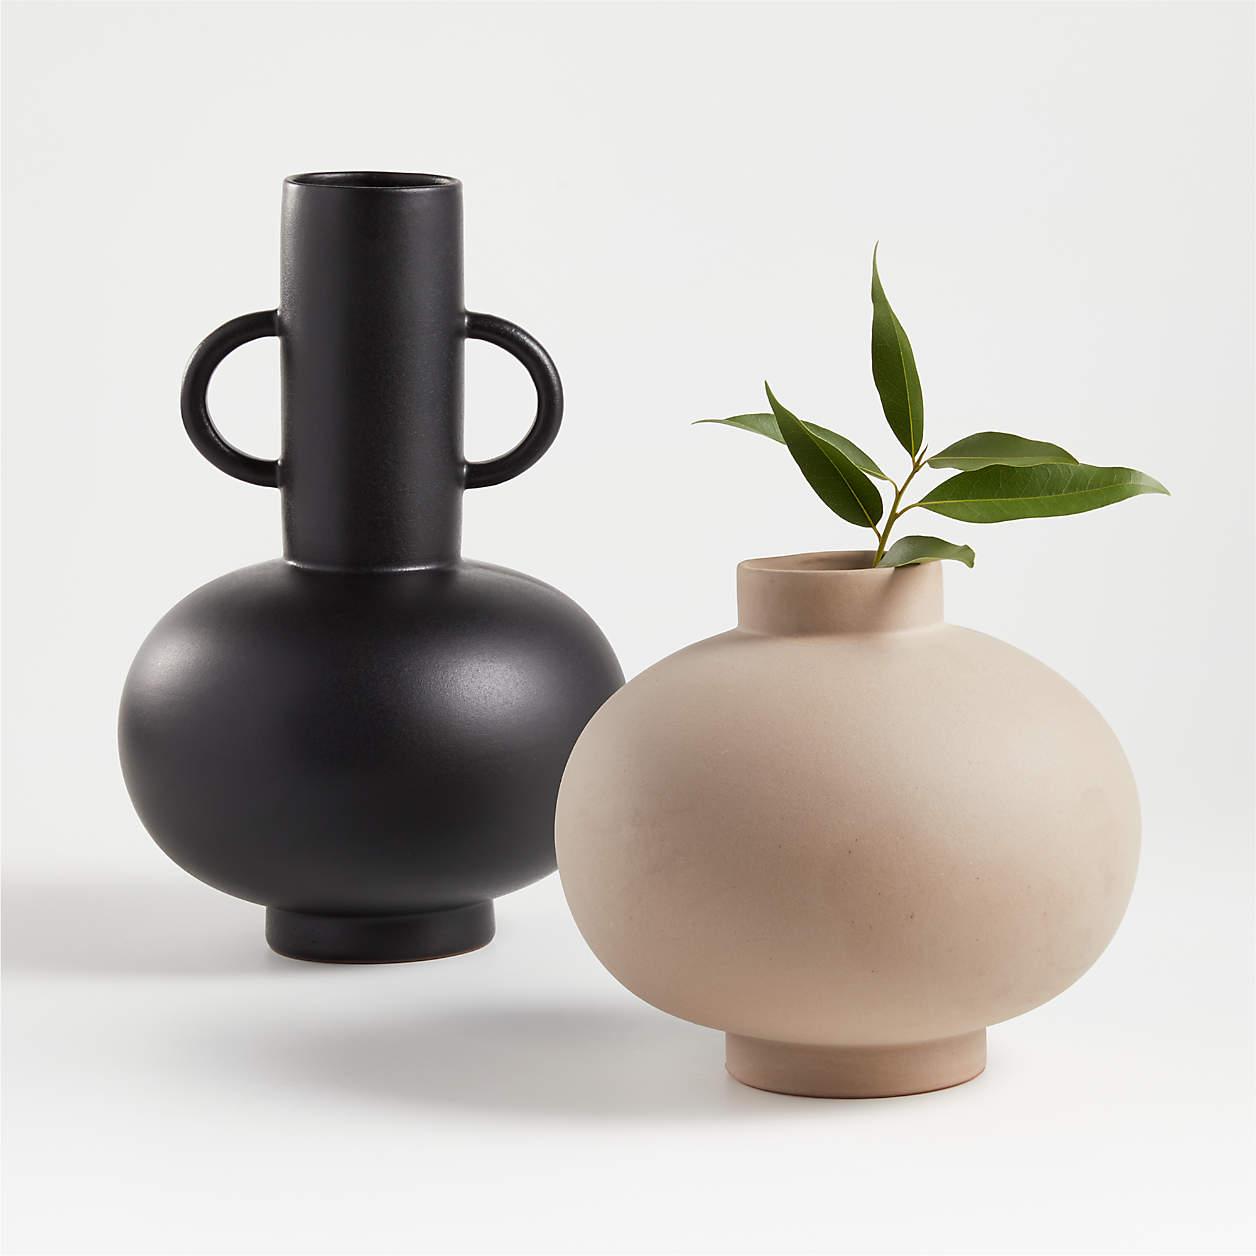 Full Moon Clay Vase